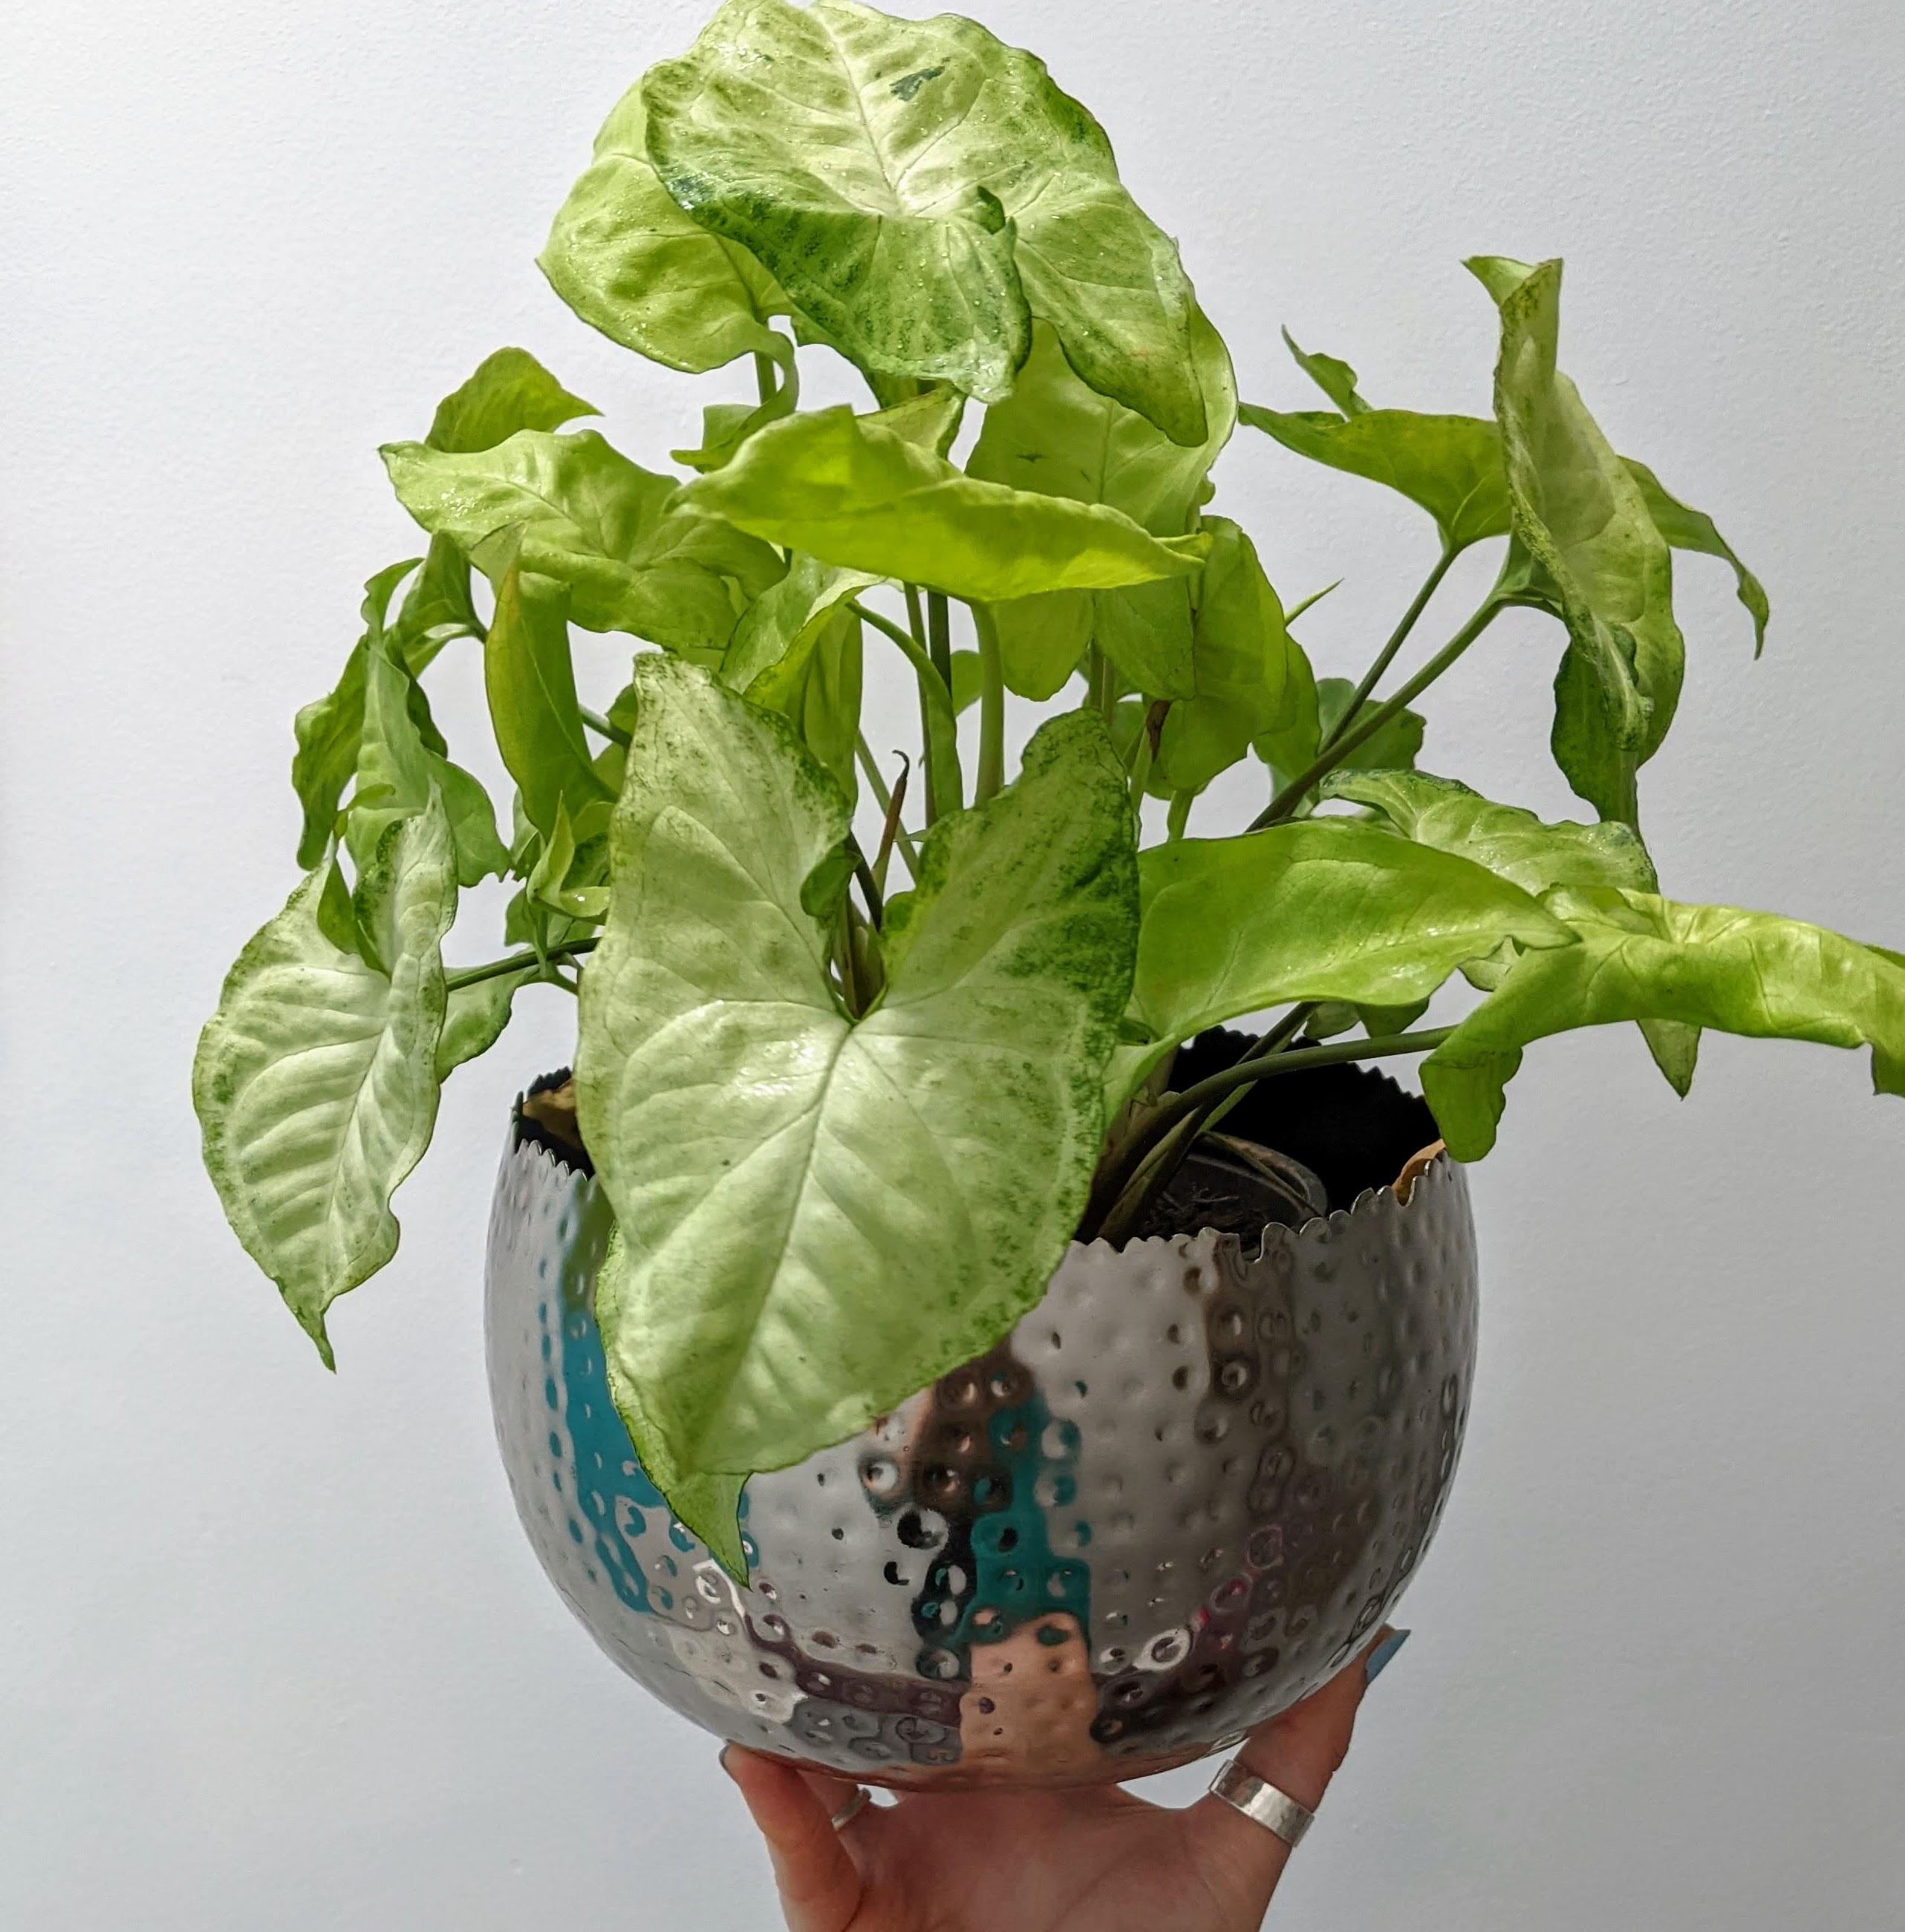 Silver Indoor Plant Pot with Syngonium podophyllum plant